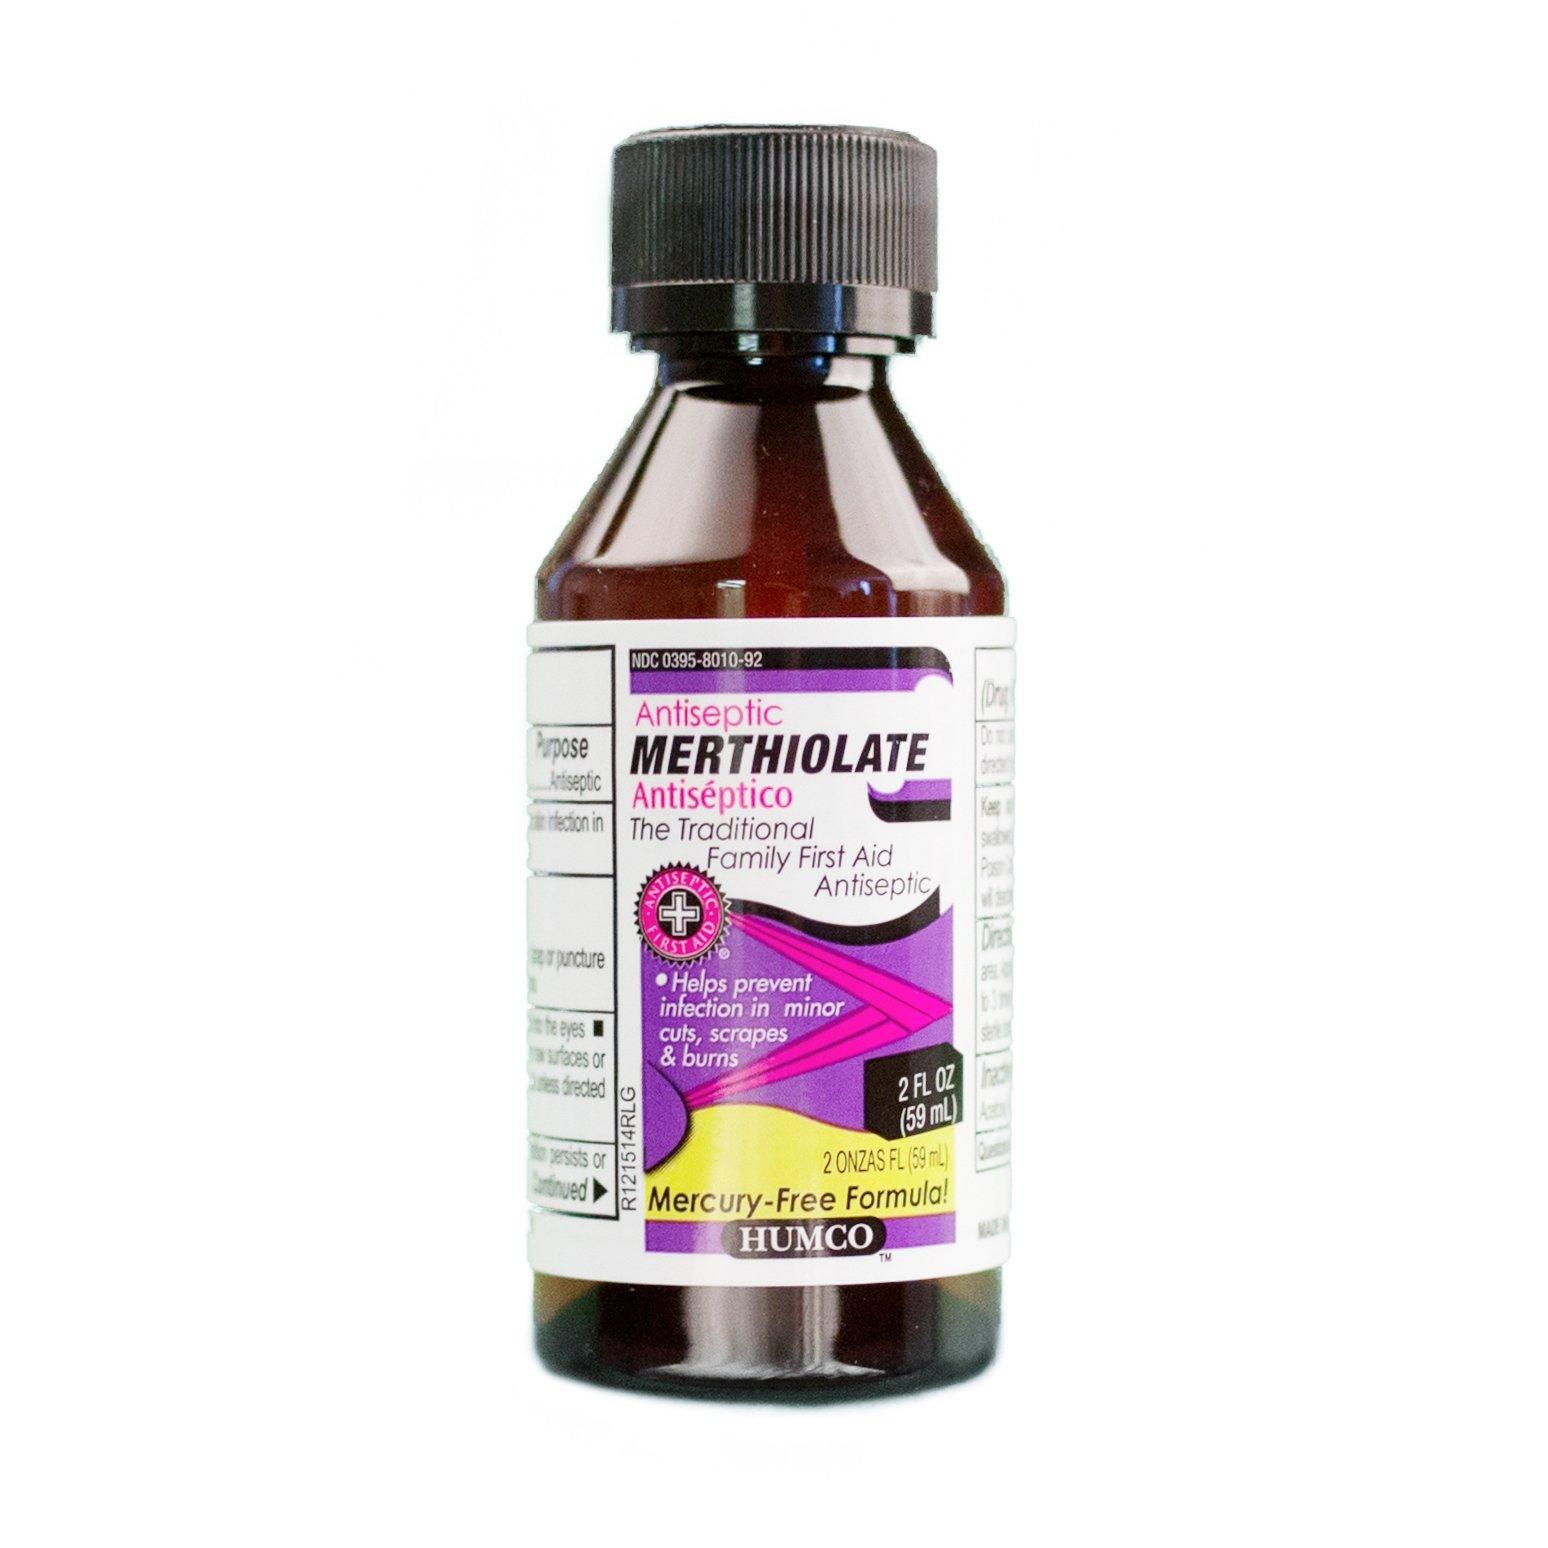 HUMCO 174992001 Merthiolate 2 oz, Shape